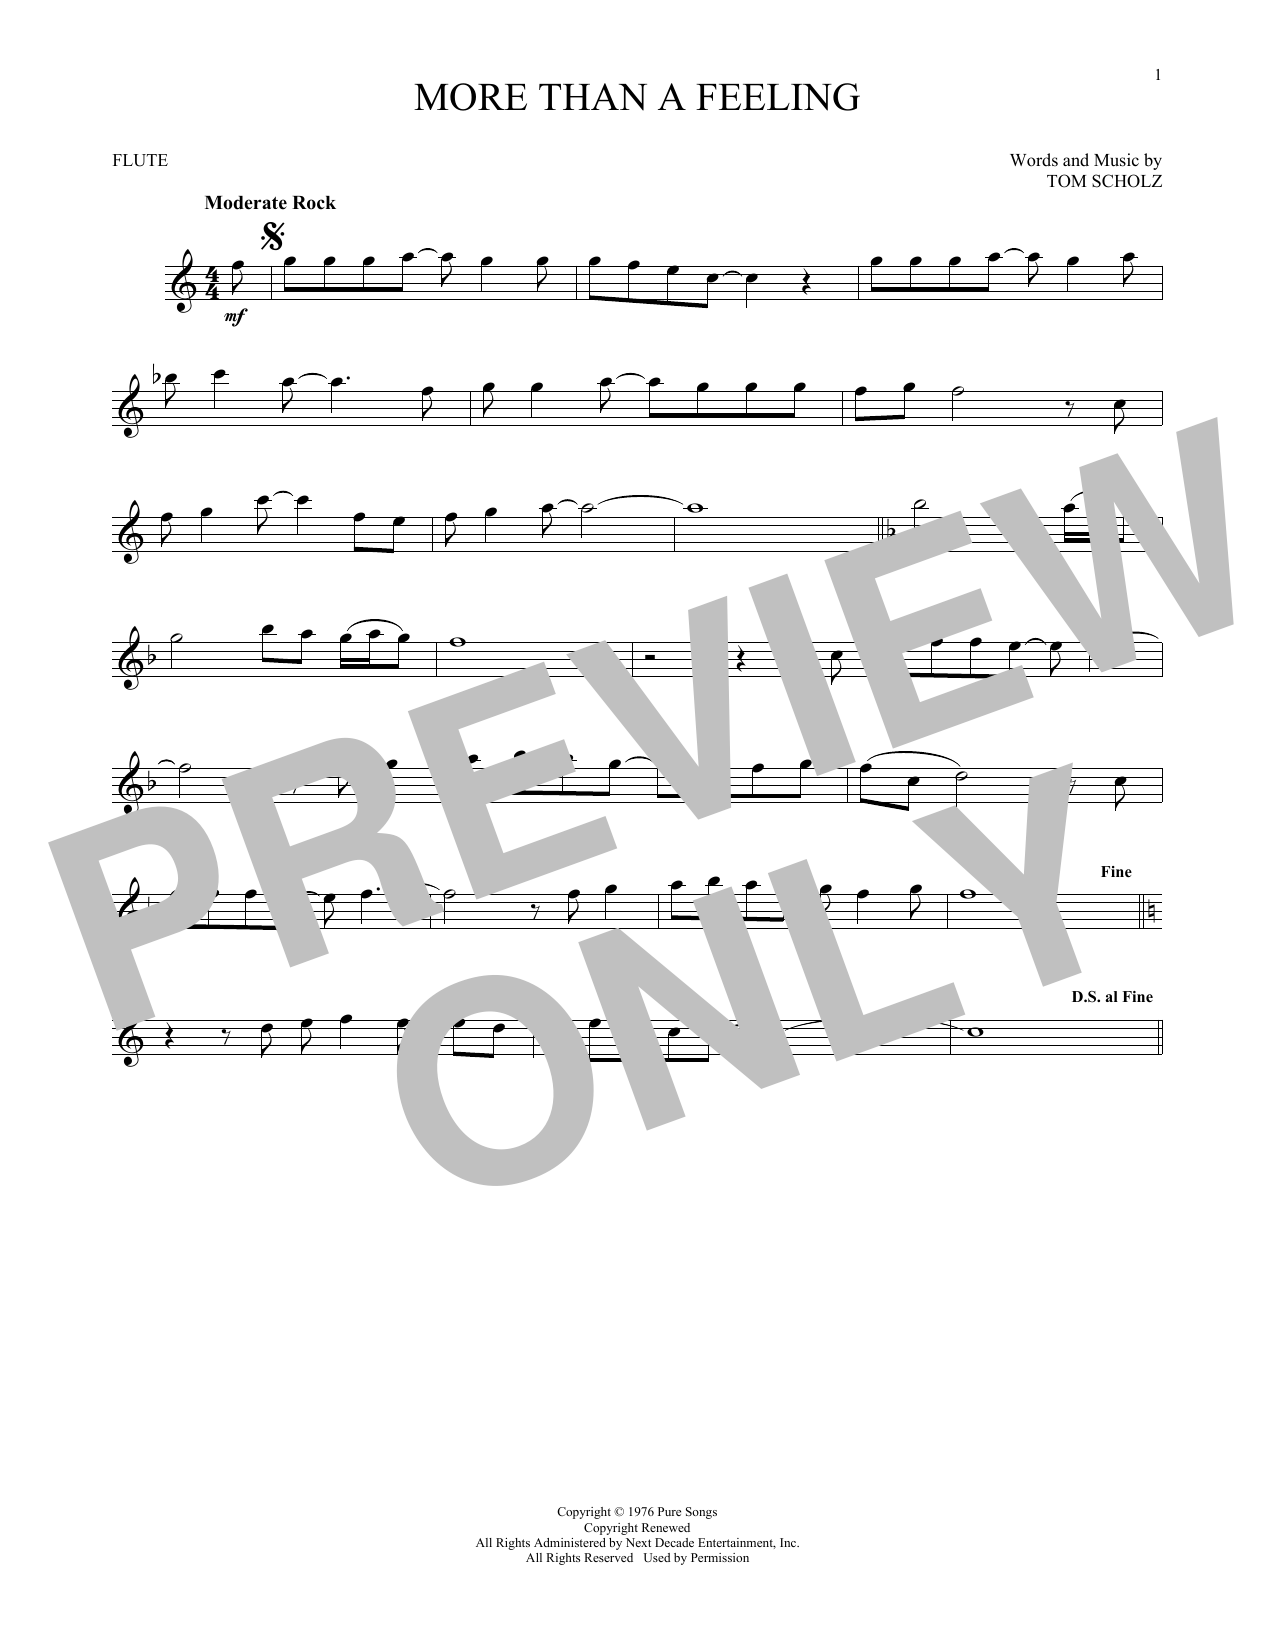 More Than A Feeling (Flute Solo)